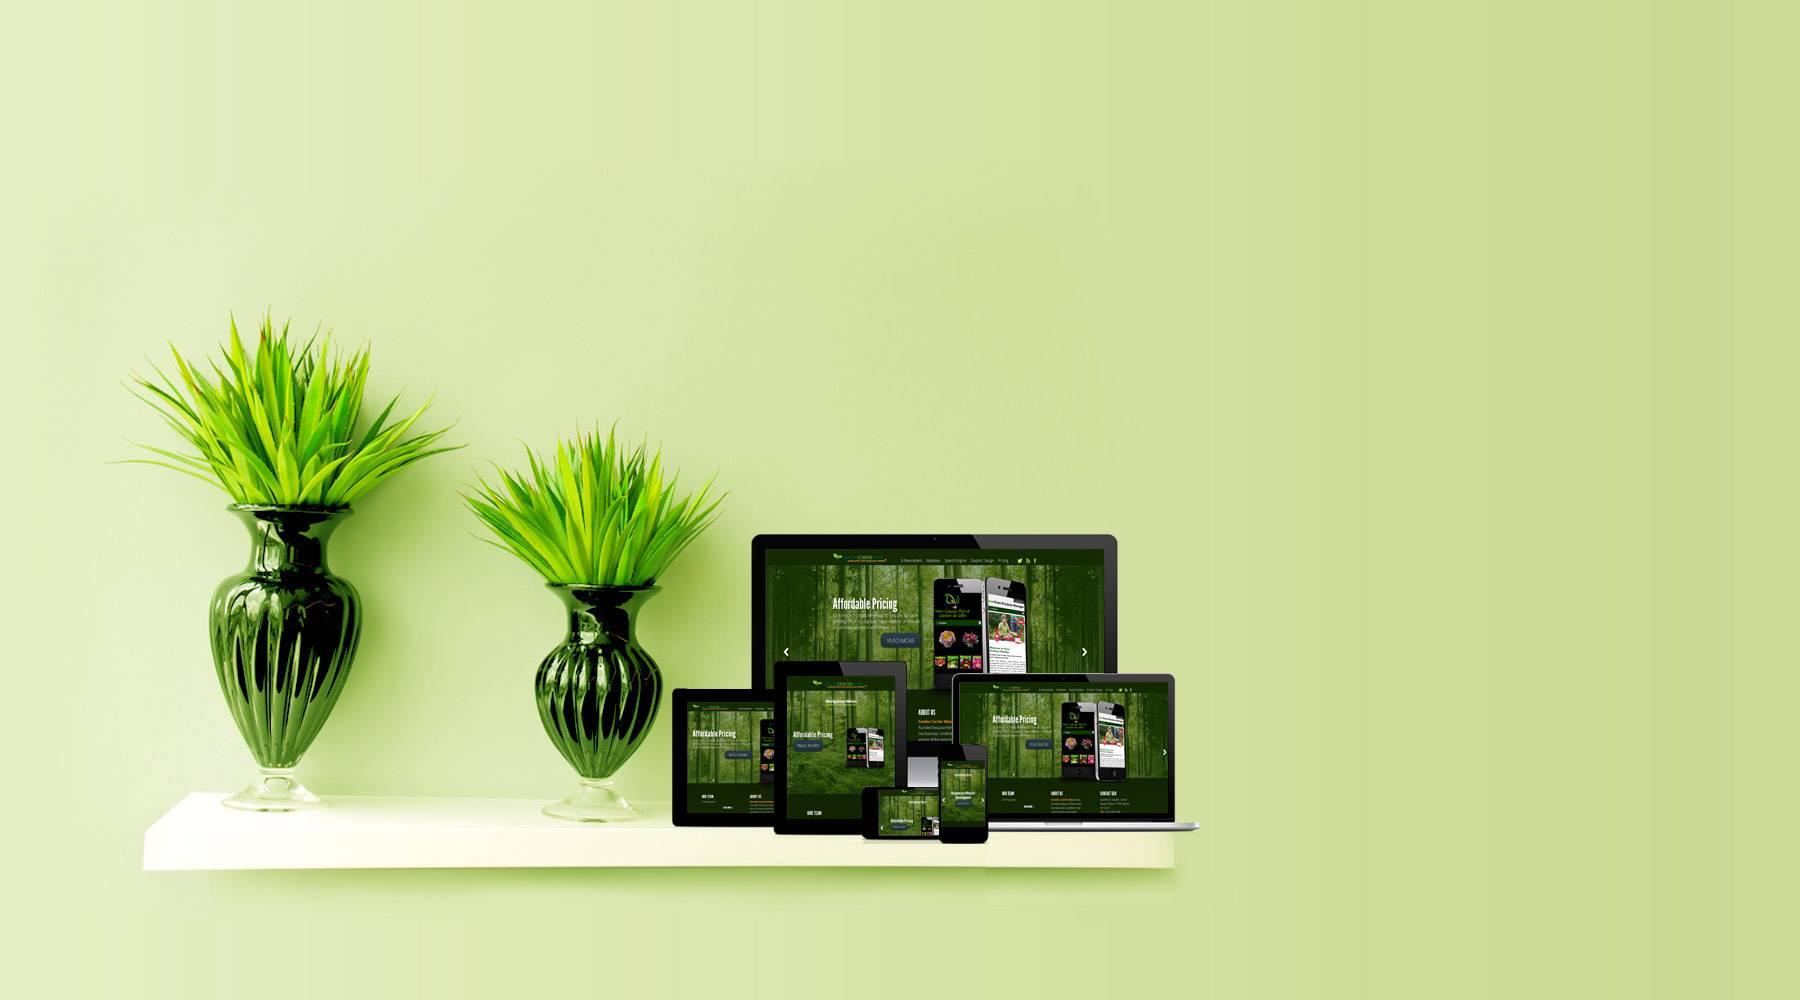 garden-center-marketing-site-affordable-pricing